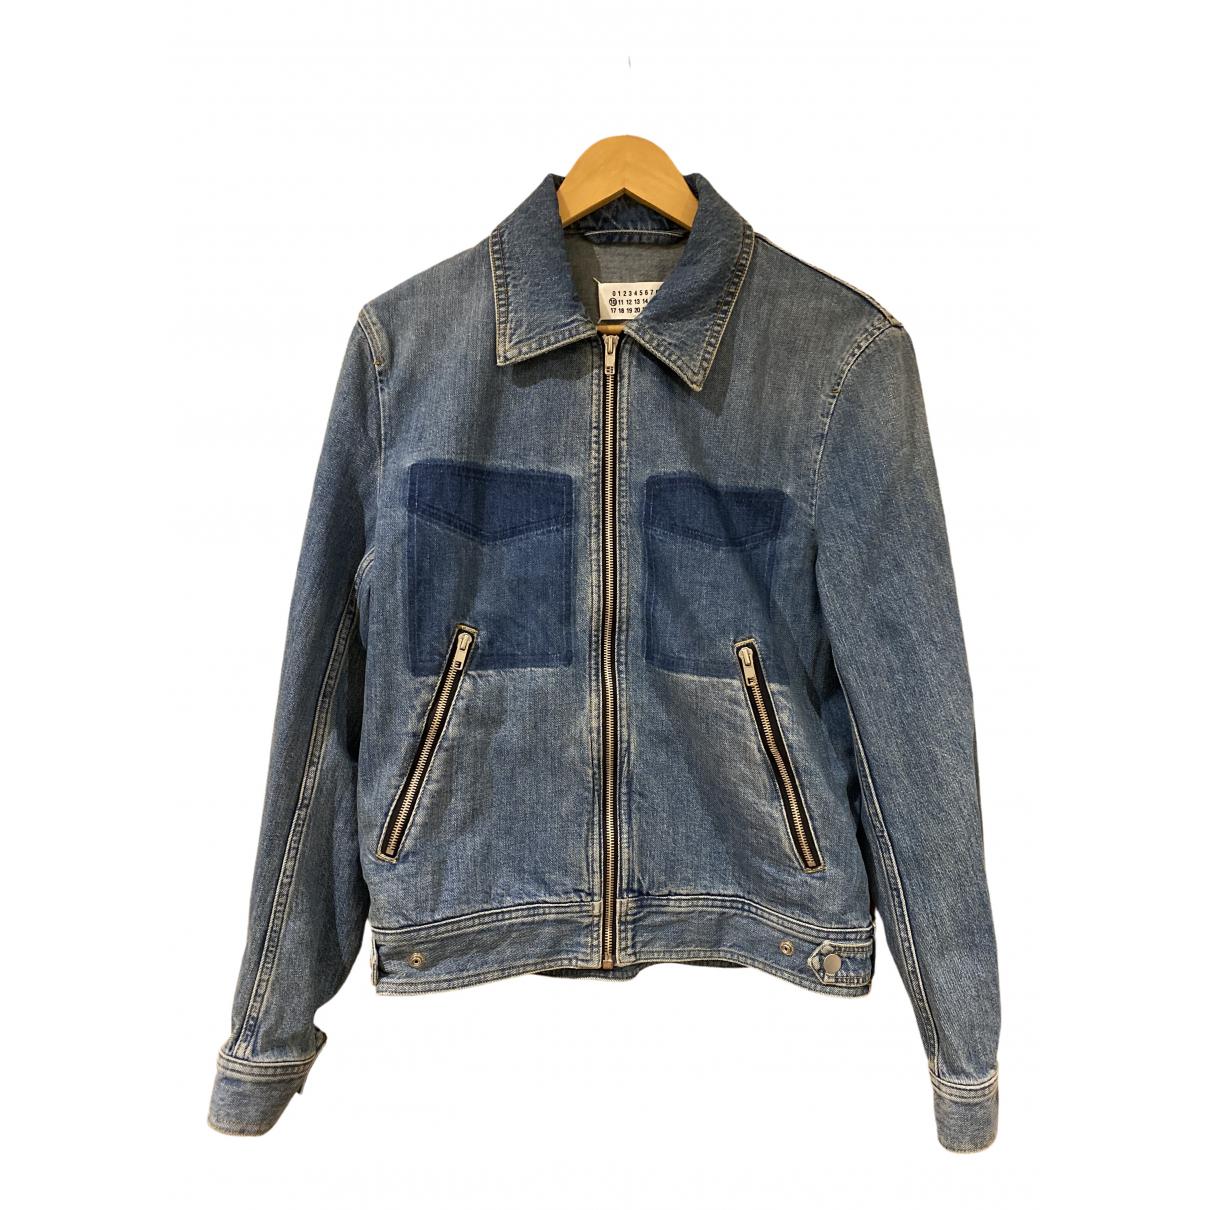 Maison Martin Margiela \N Jacke in  Blau Denim - Jeans